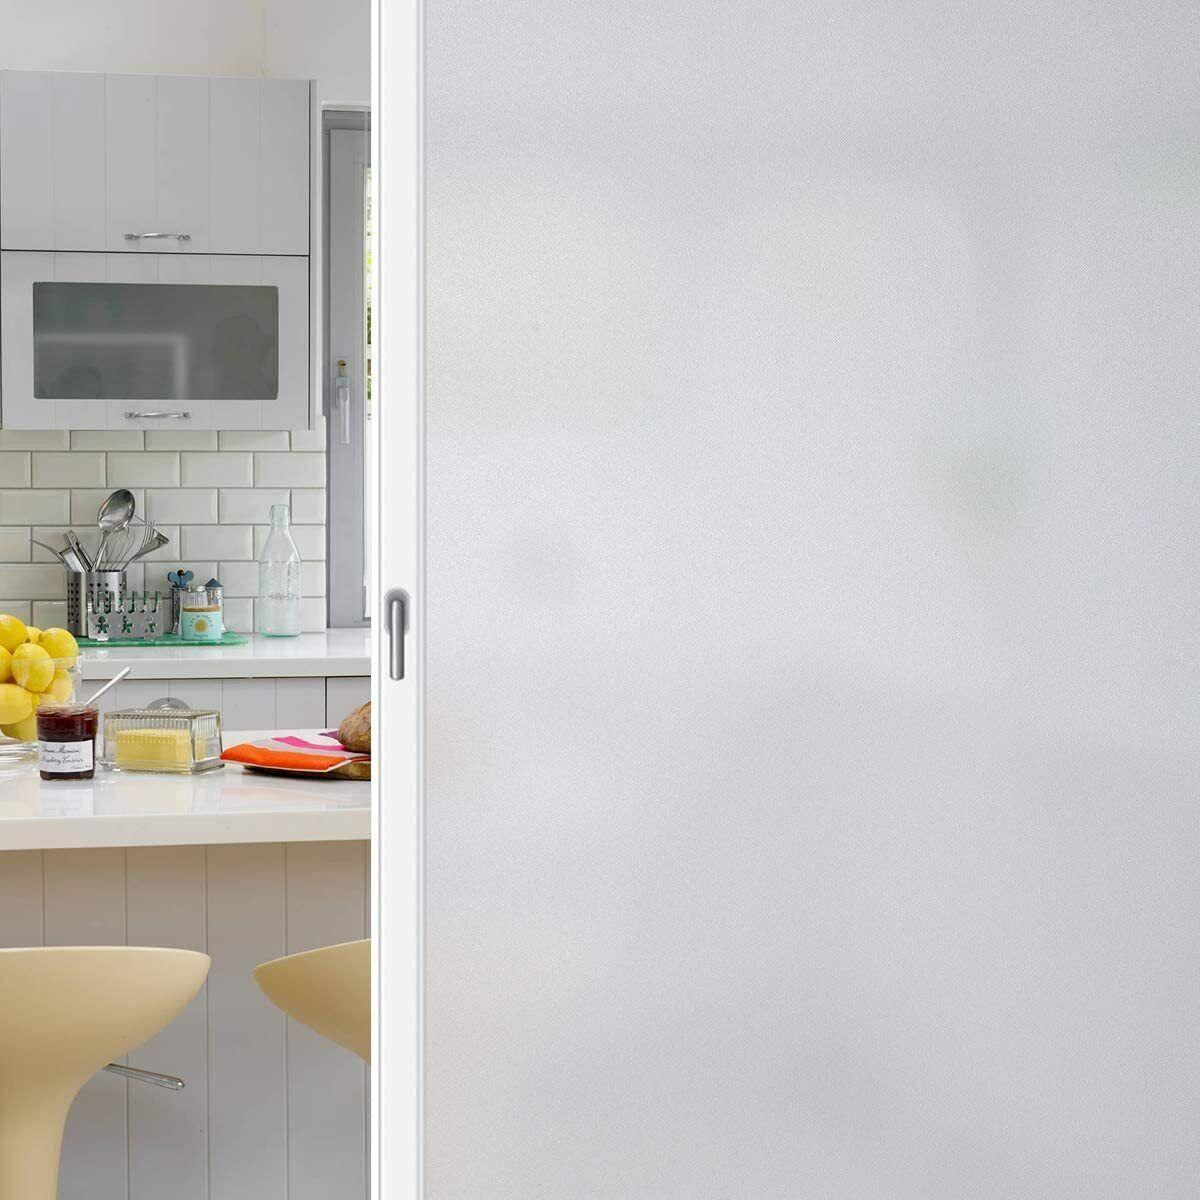 Coavas Privacy Window Non-Adhesive Glass Window Cling Anti U